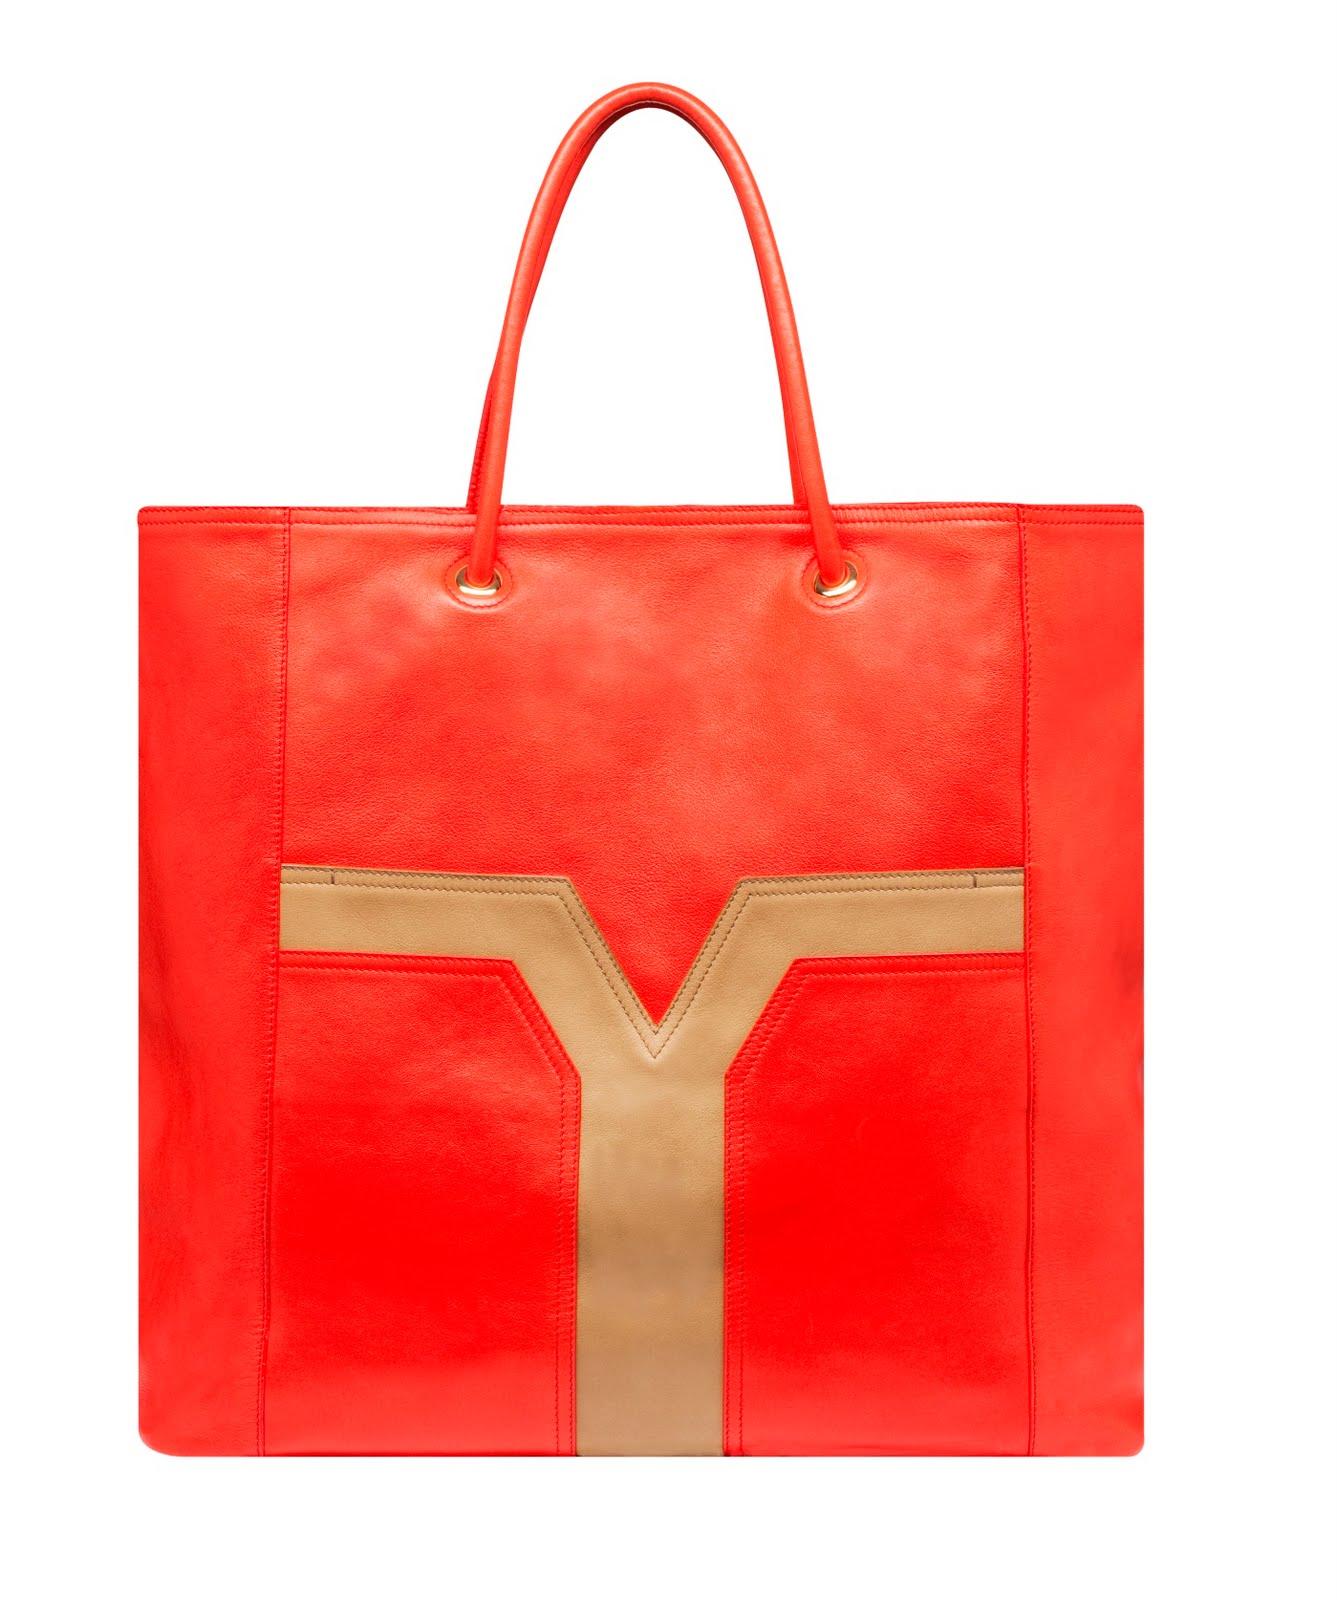 Hong Kong Fashion Geek: Bag Lady: YSL Lucky Chic